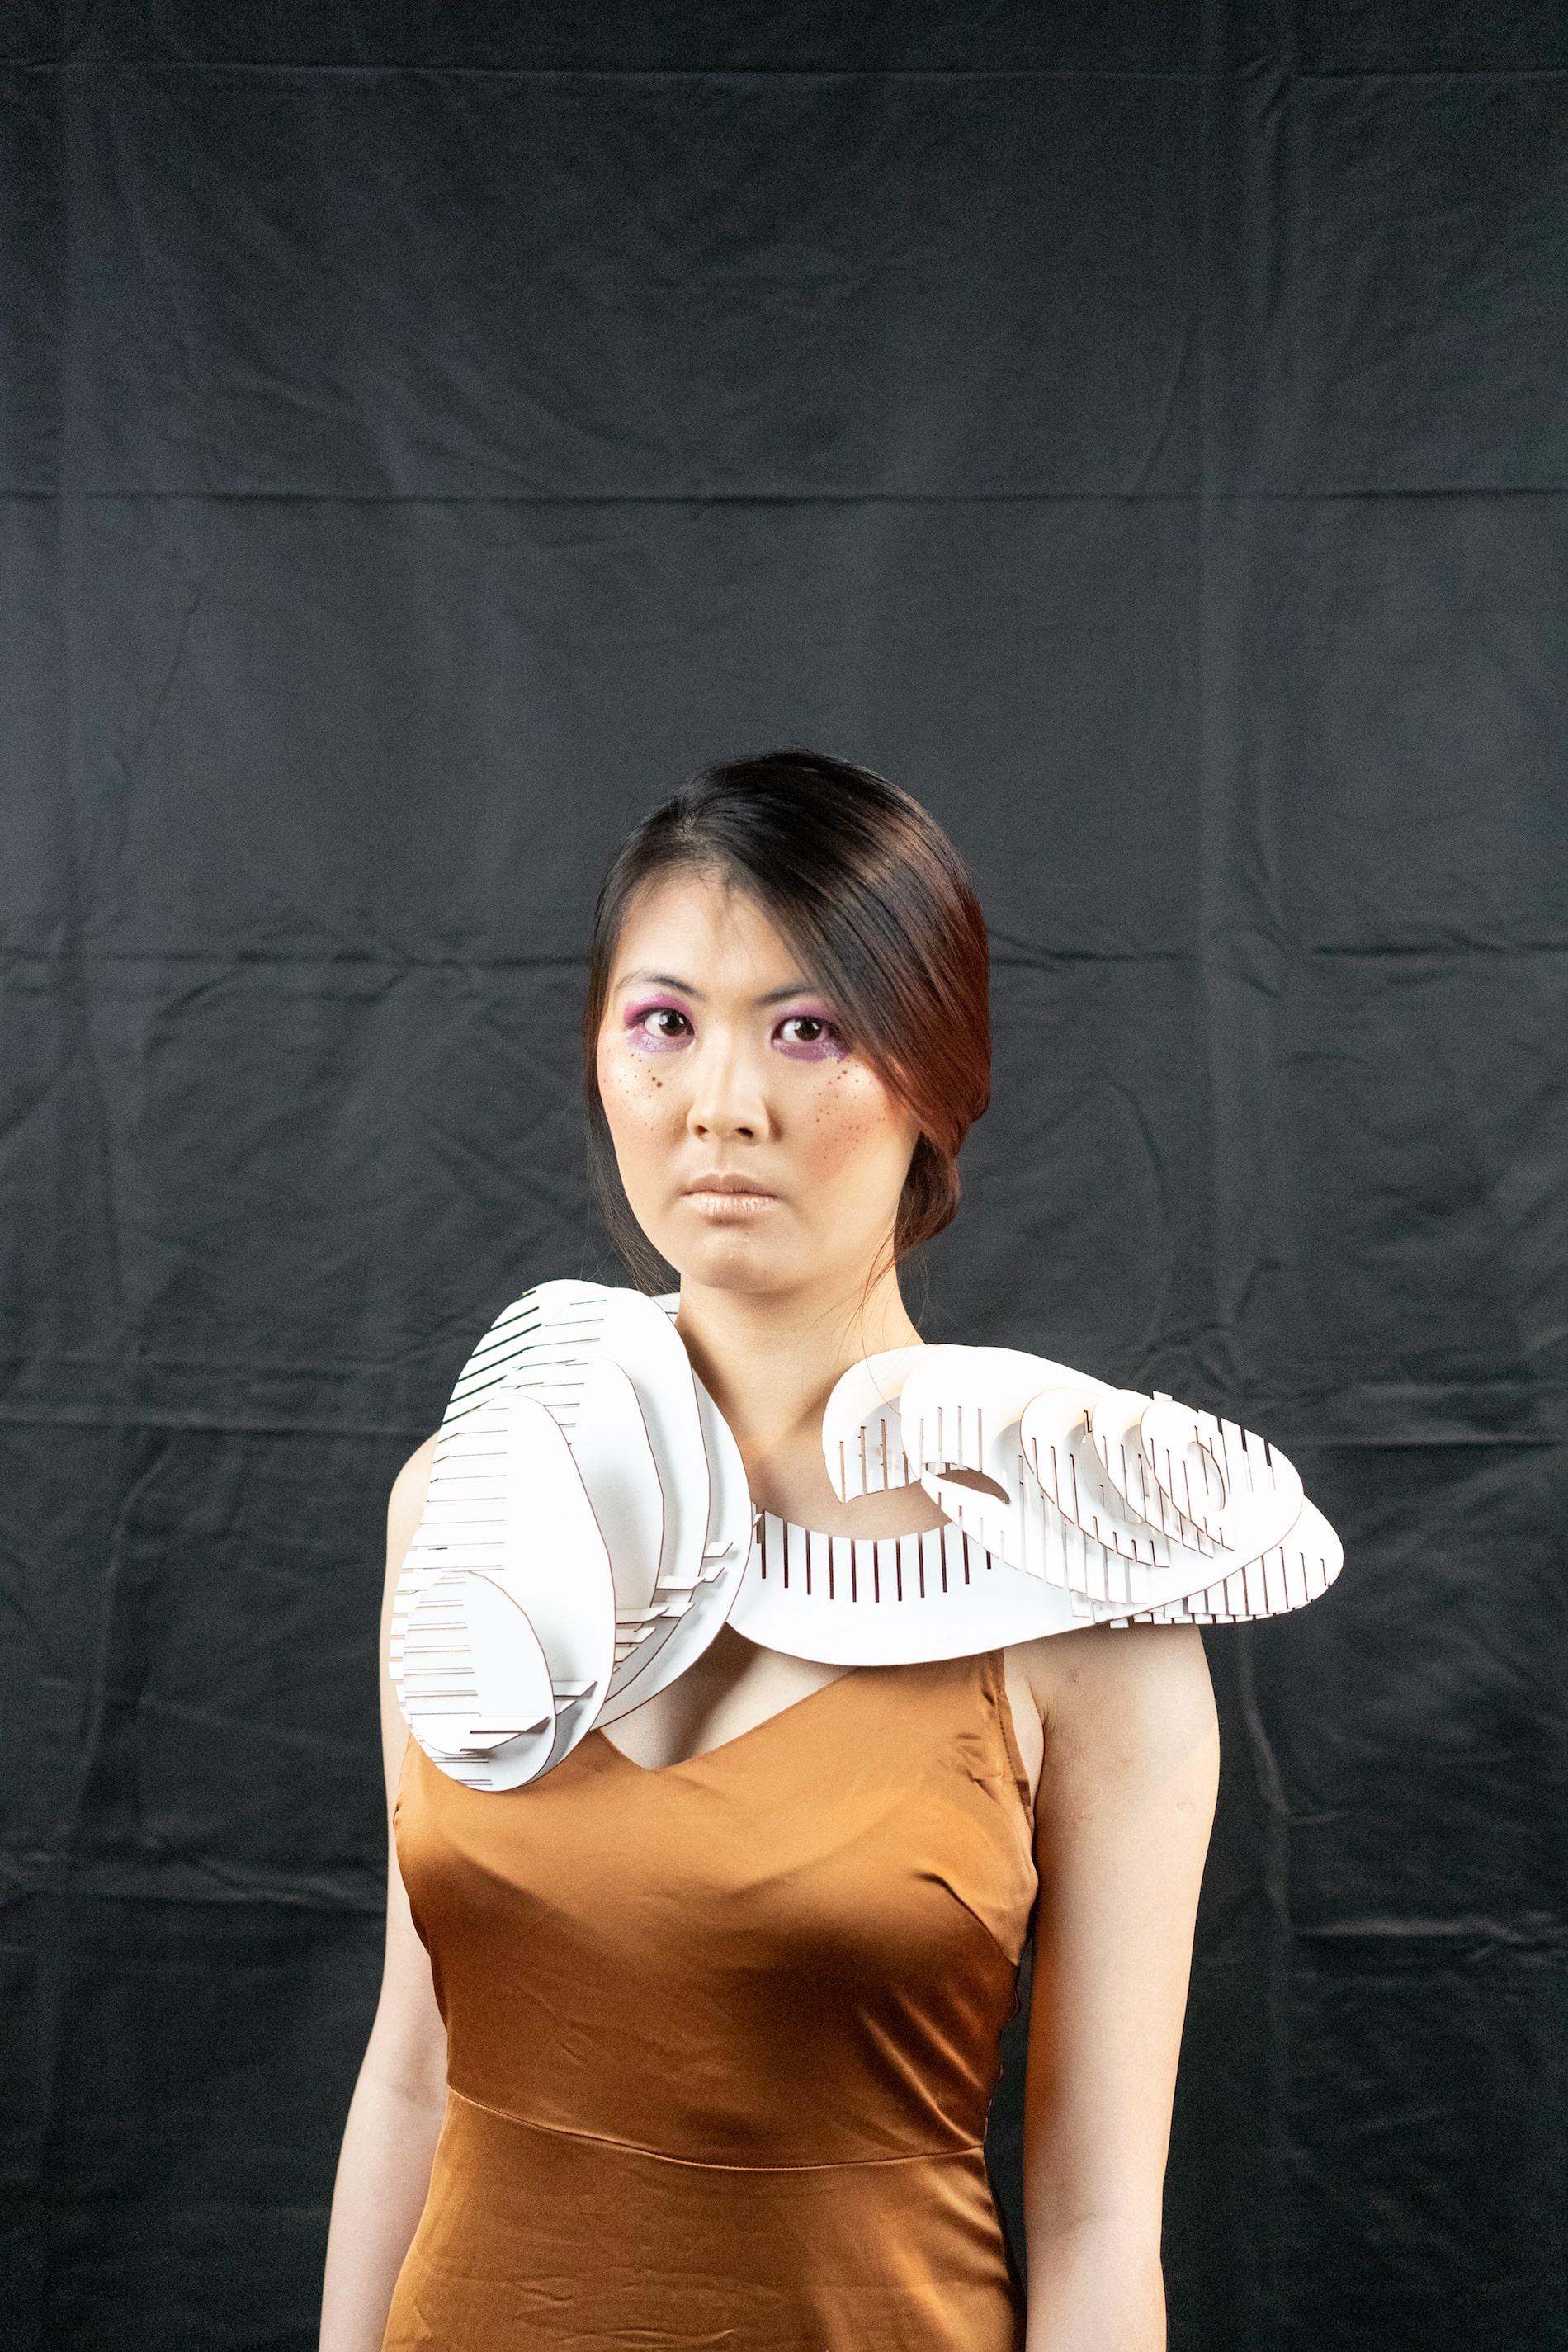 Model with cardboard cutout ornament